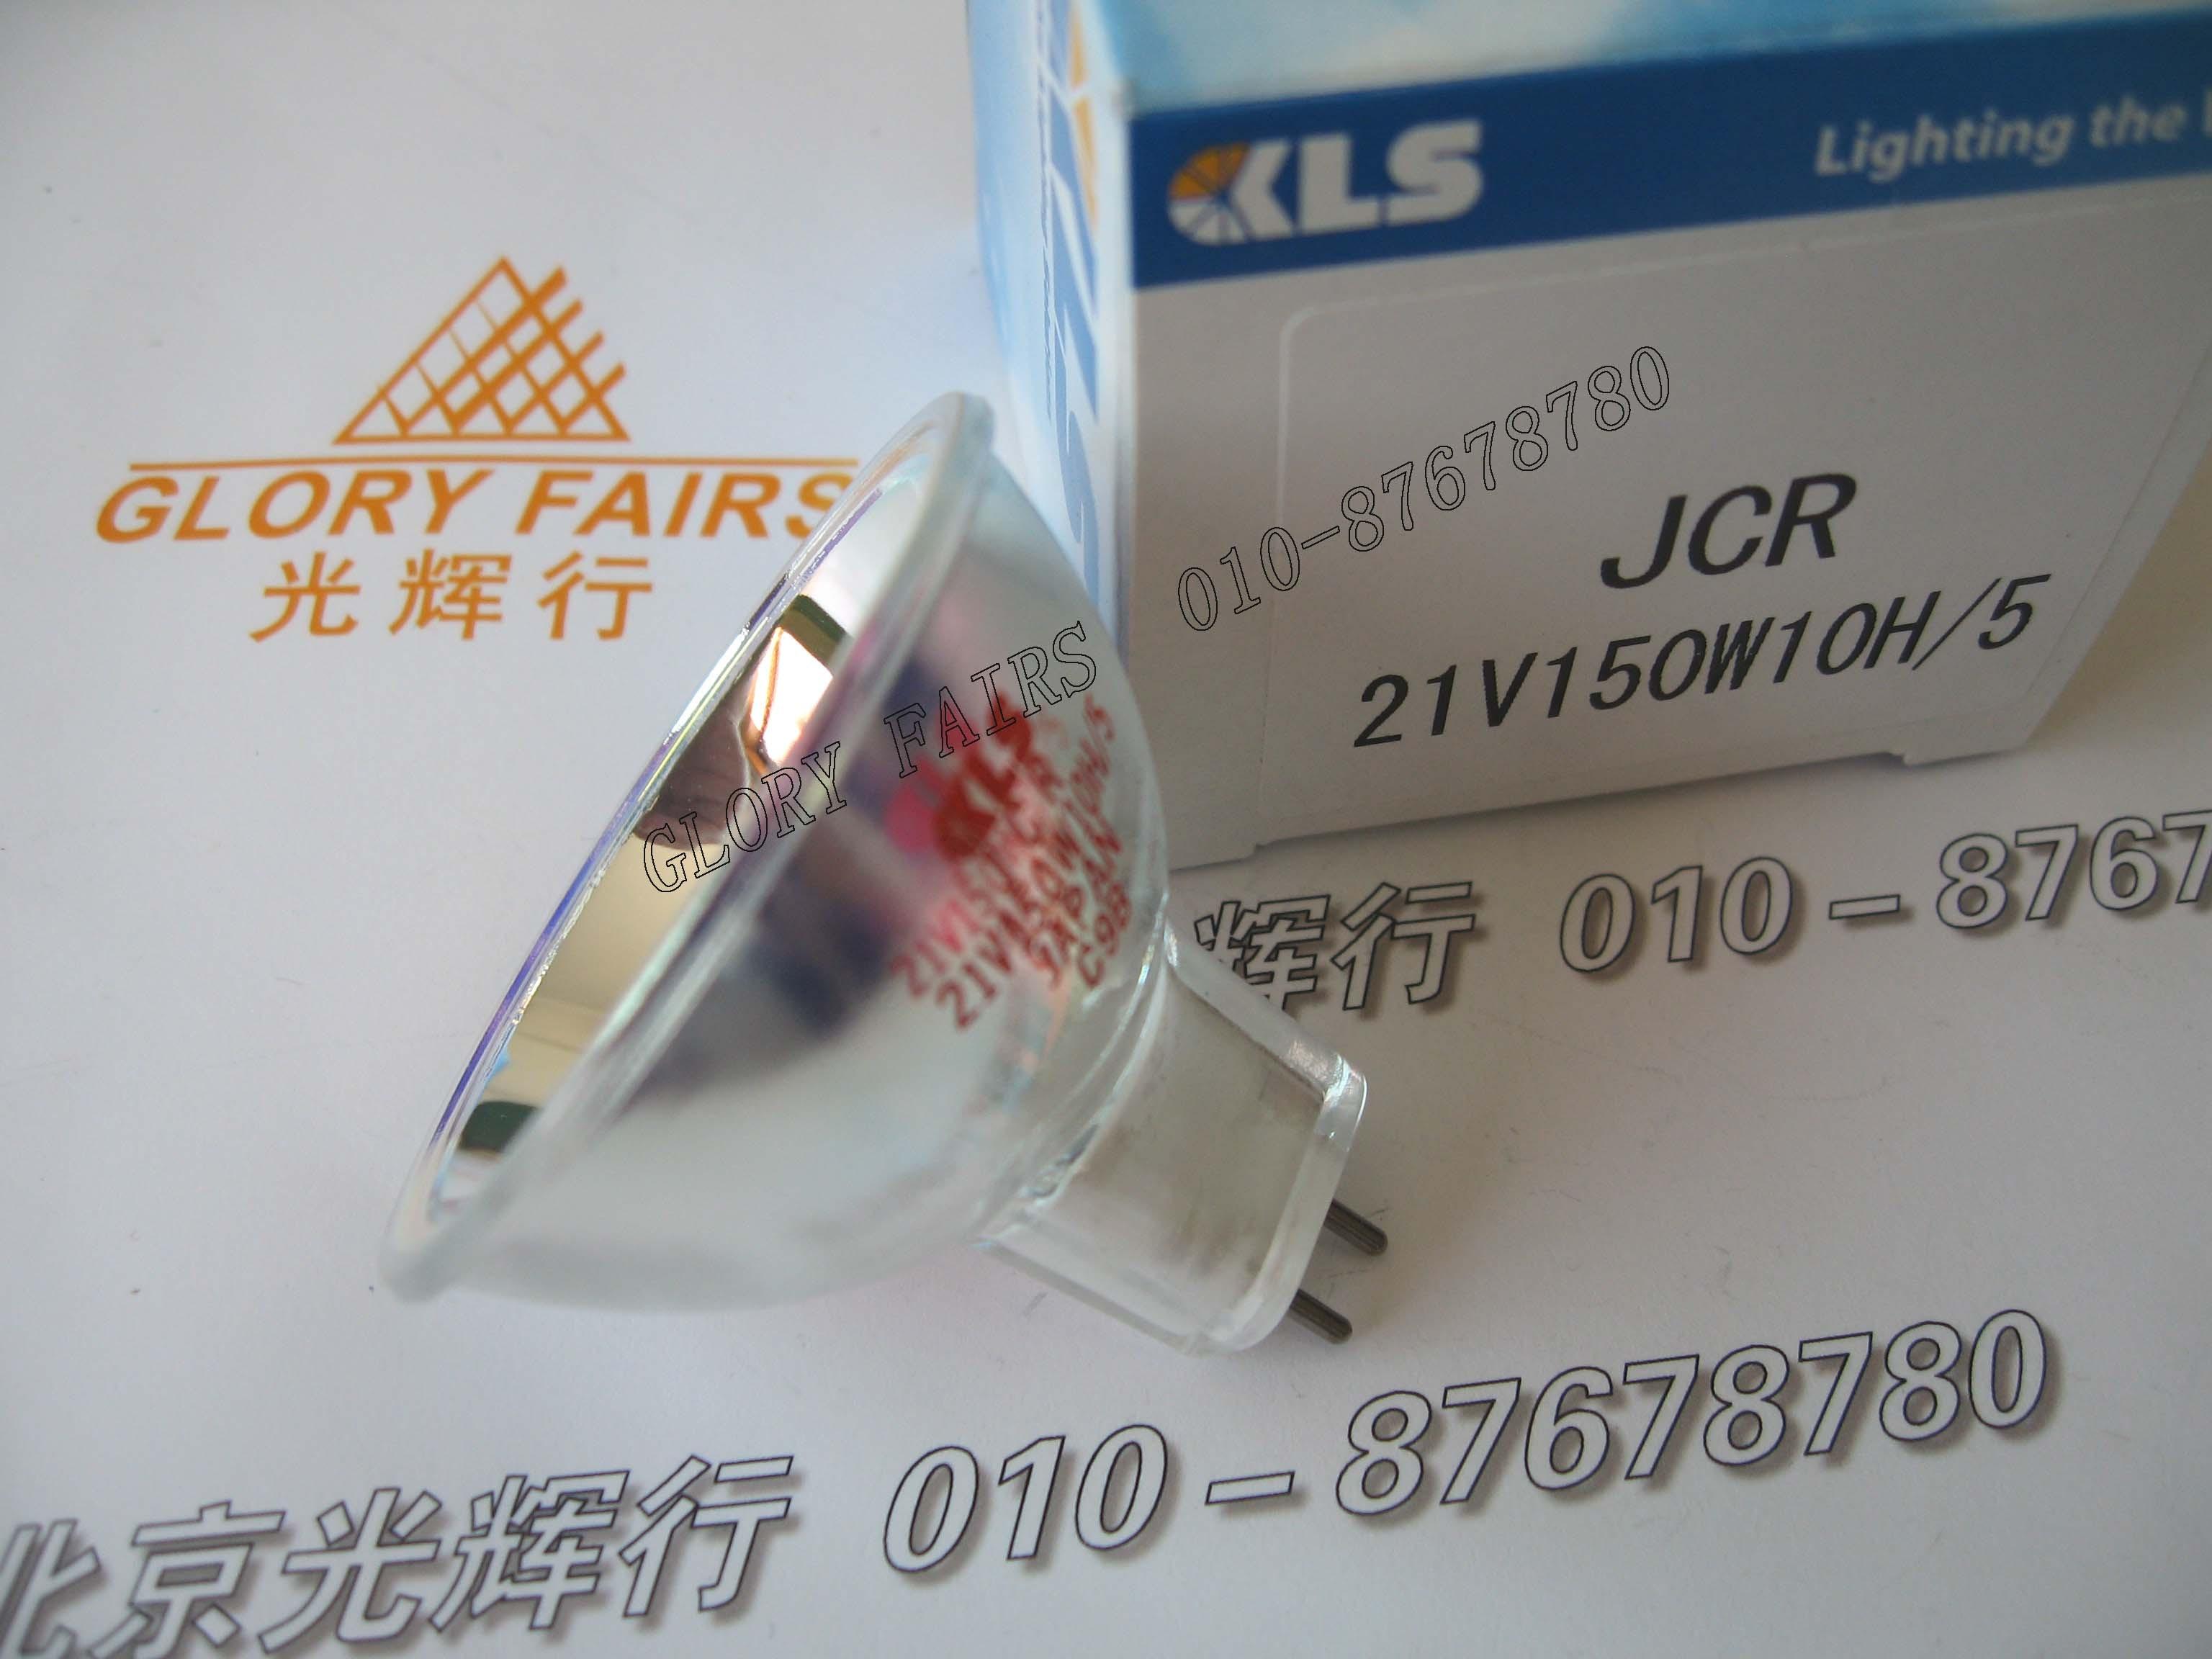 Tablet Accessories Computer & Office Kls Jcr 21v150w10h/5 Japan Halogen Lamp,1000 Hours Long Life Eke,microscope Fiber Optic Light Source,eke/x Eke/l,21v 150w Bulb